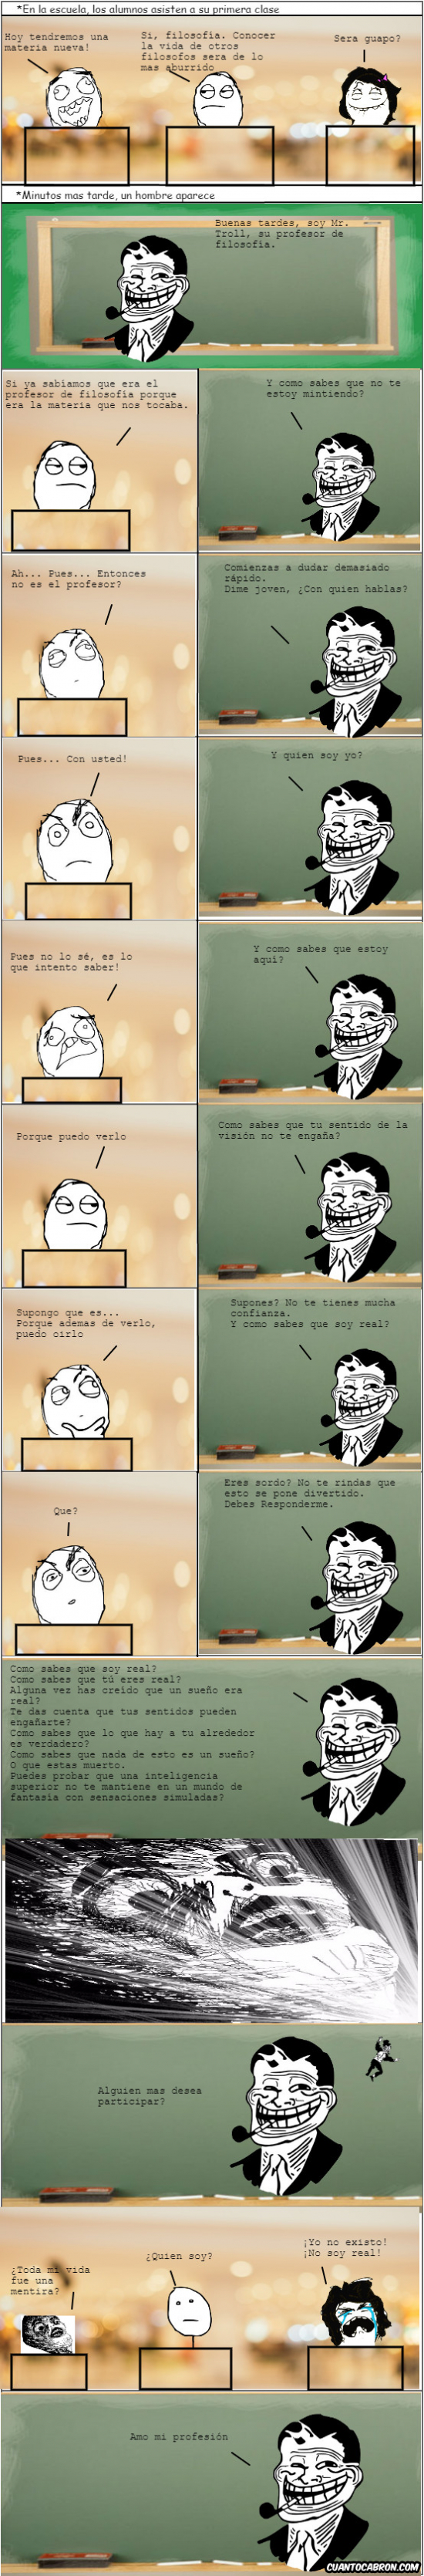 Trolldad - Los filósofos trolls